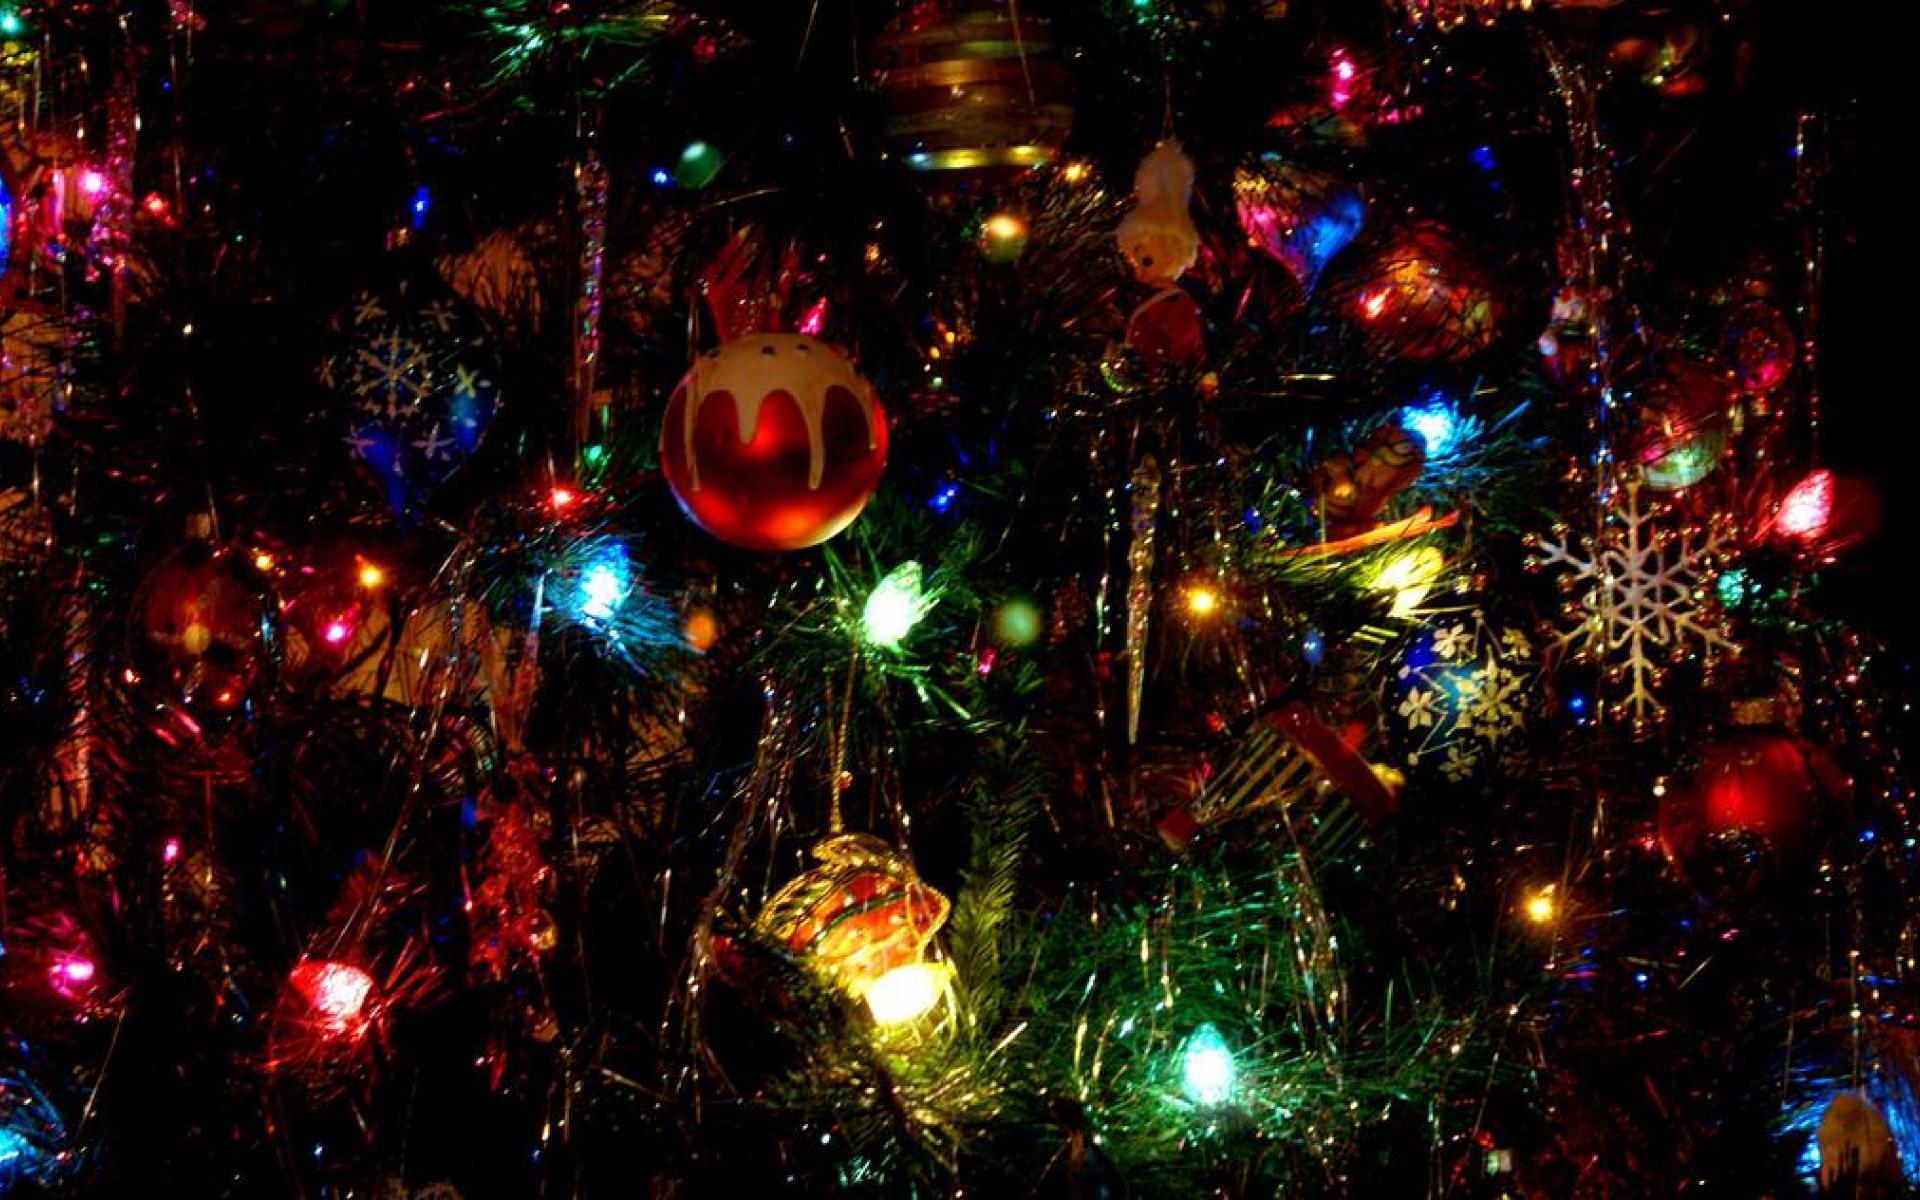 100 Holiday Lights Desktop Wallpaper Hd Wallpapers: HD Christmas Lights Wallpaper